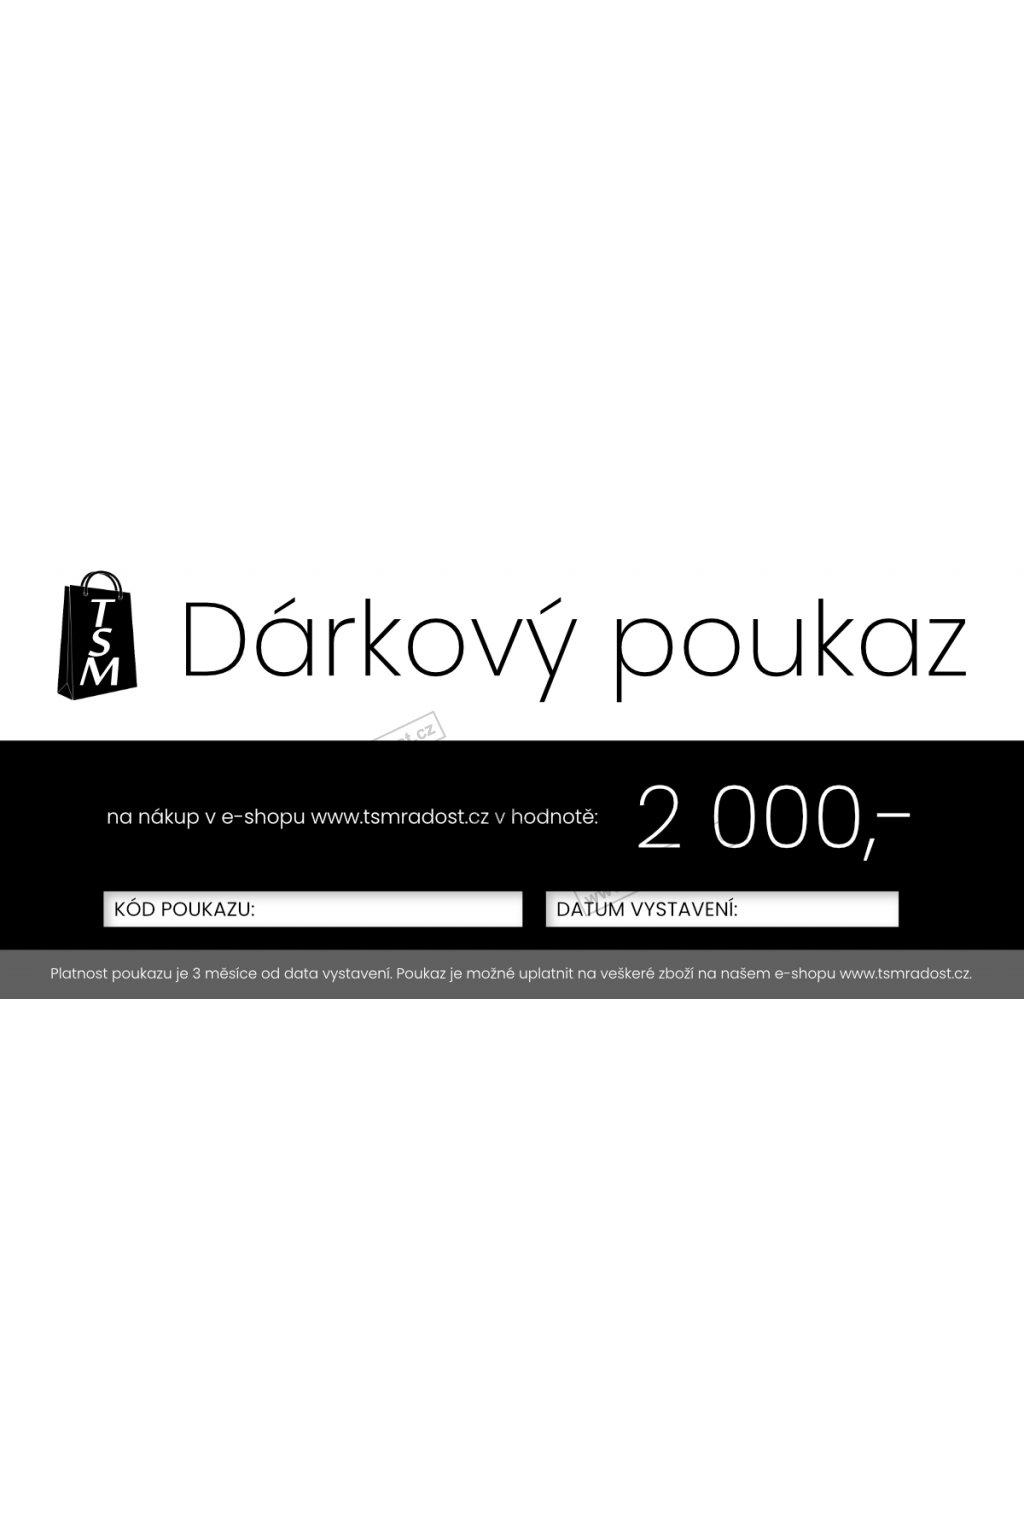 TSM darkovy poukaz1a 2000